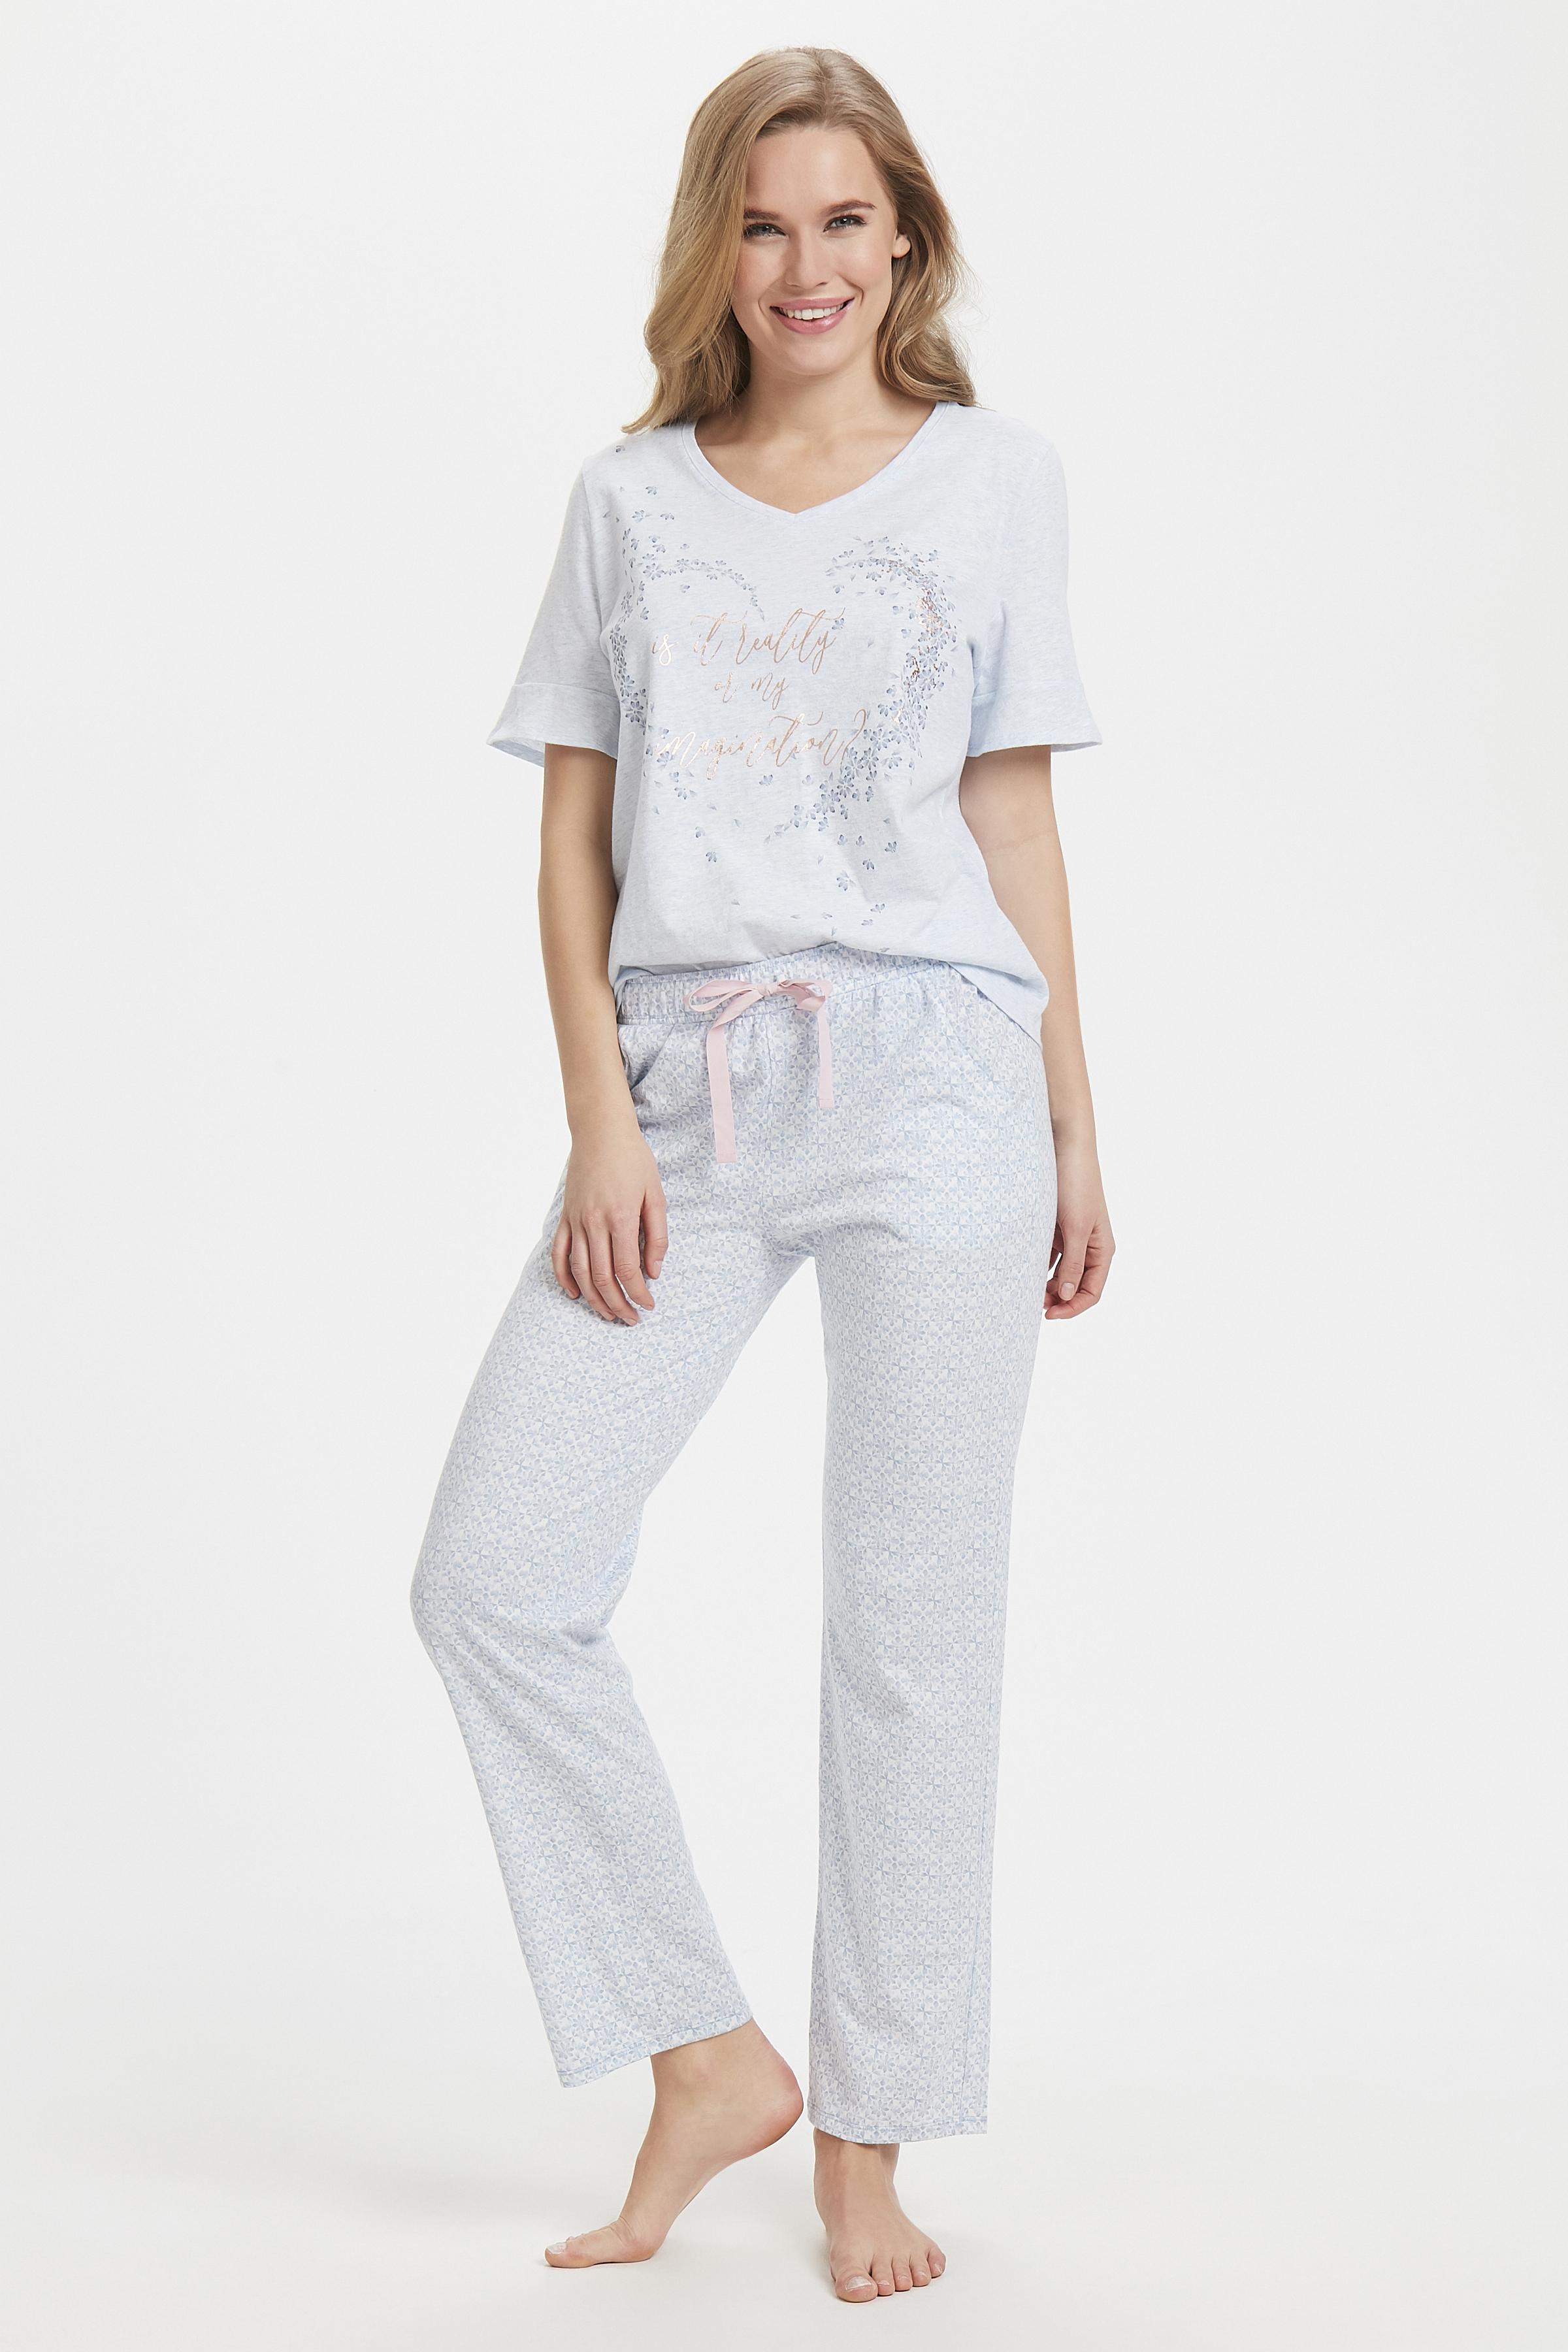 Ljusblå/off-white Homewear set från Triumph – Köp Ljusblå/off-white Homewear set från stl. 36-46 här